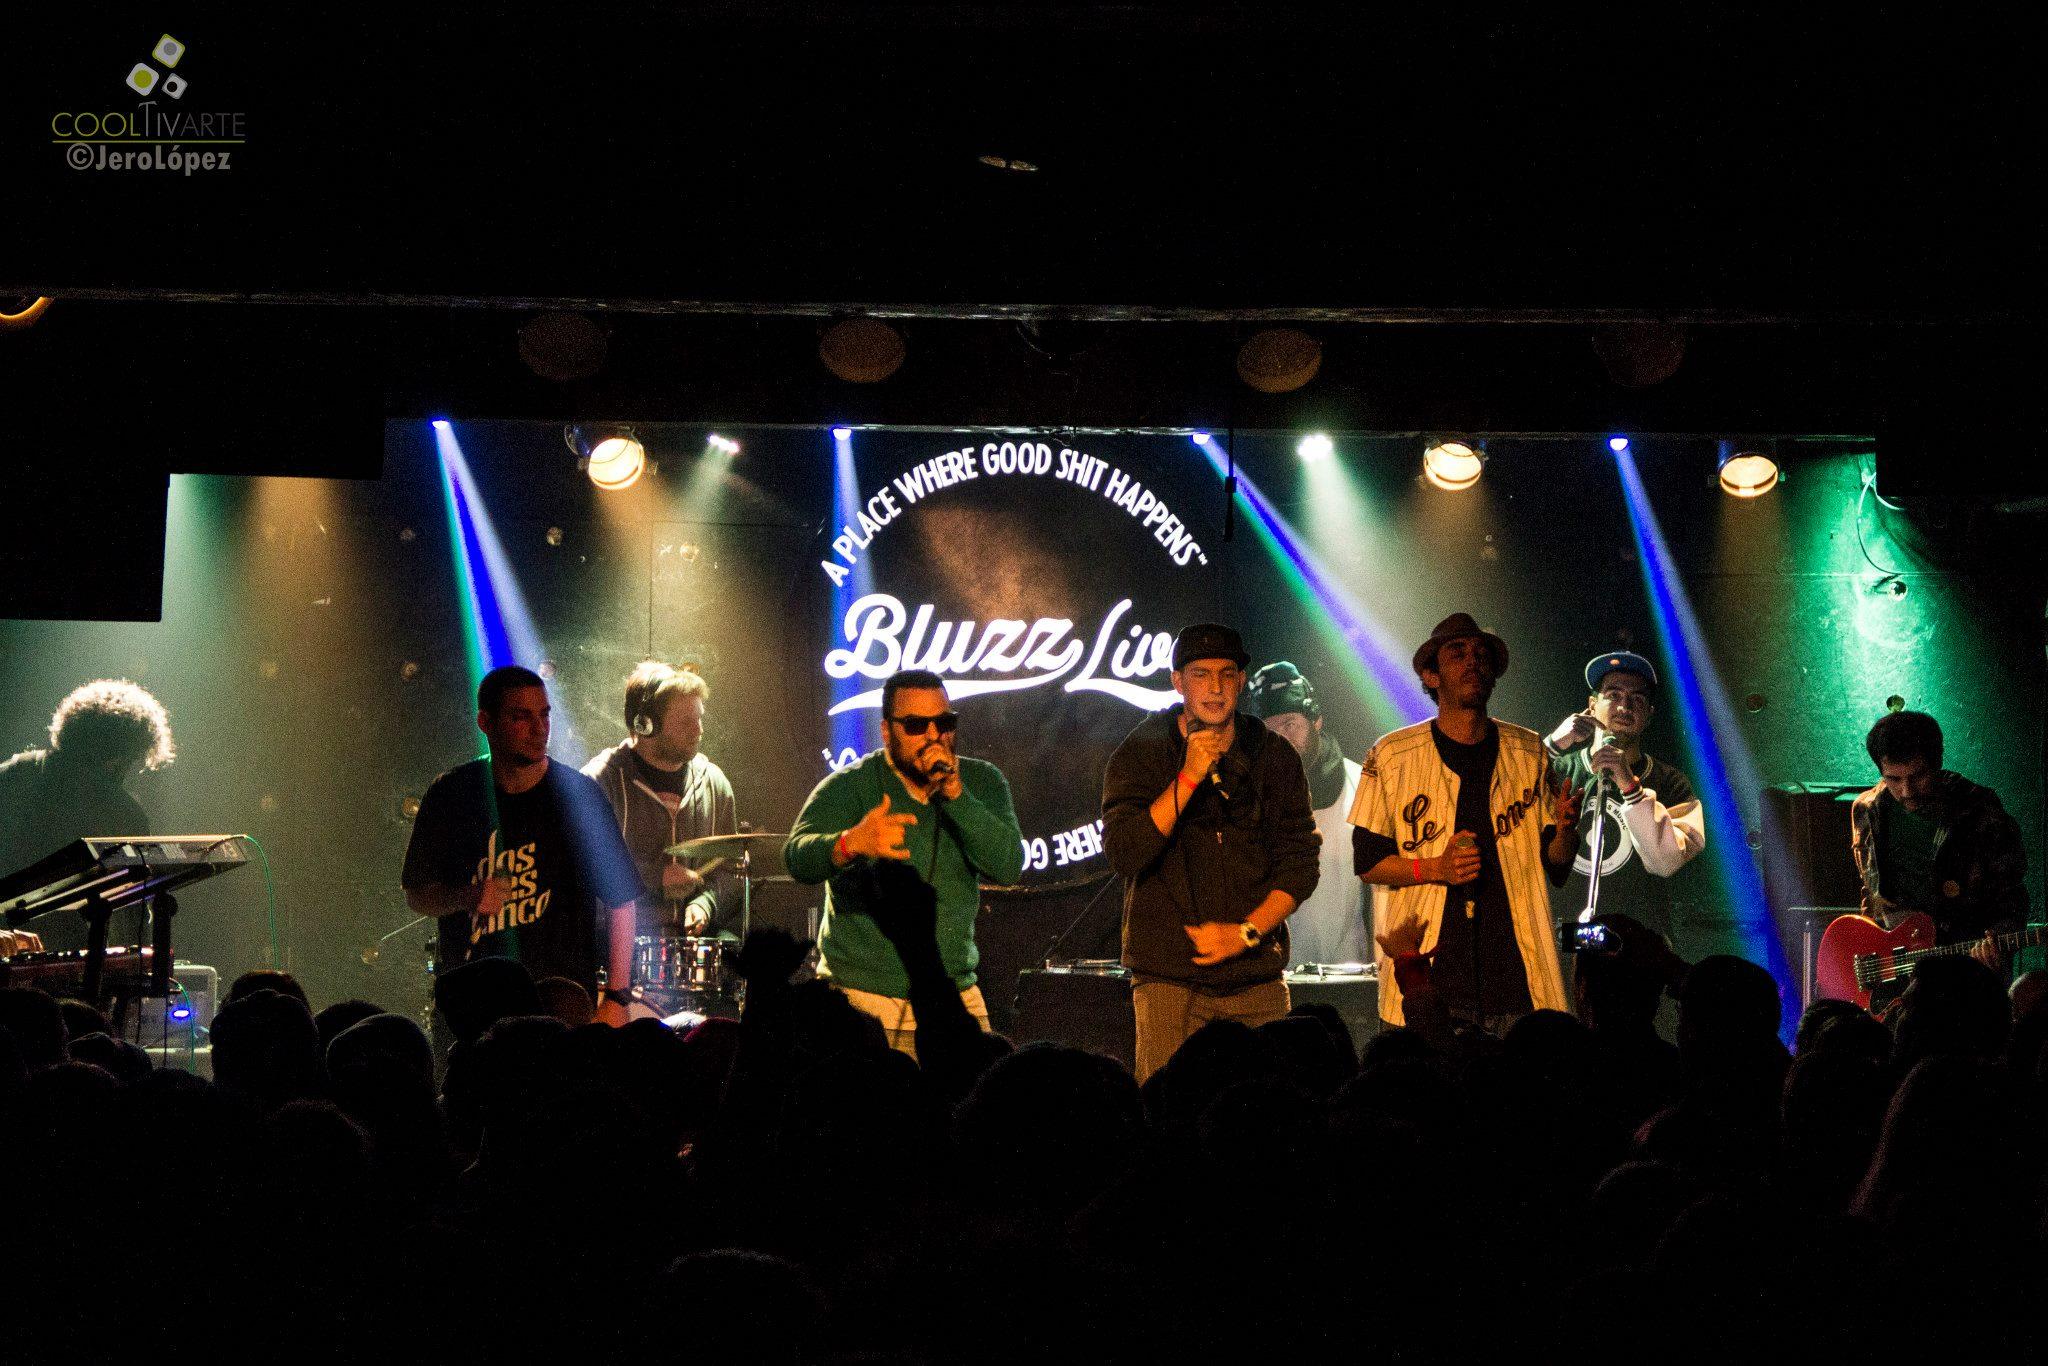 imagen - DOSTRESCINCO en Bluzz Live 18 de julio 2015 Foto © Jerónimo López